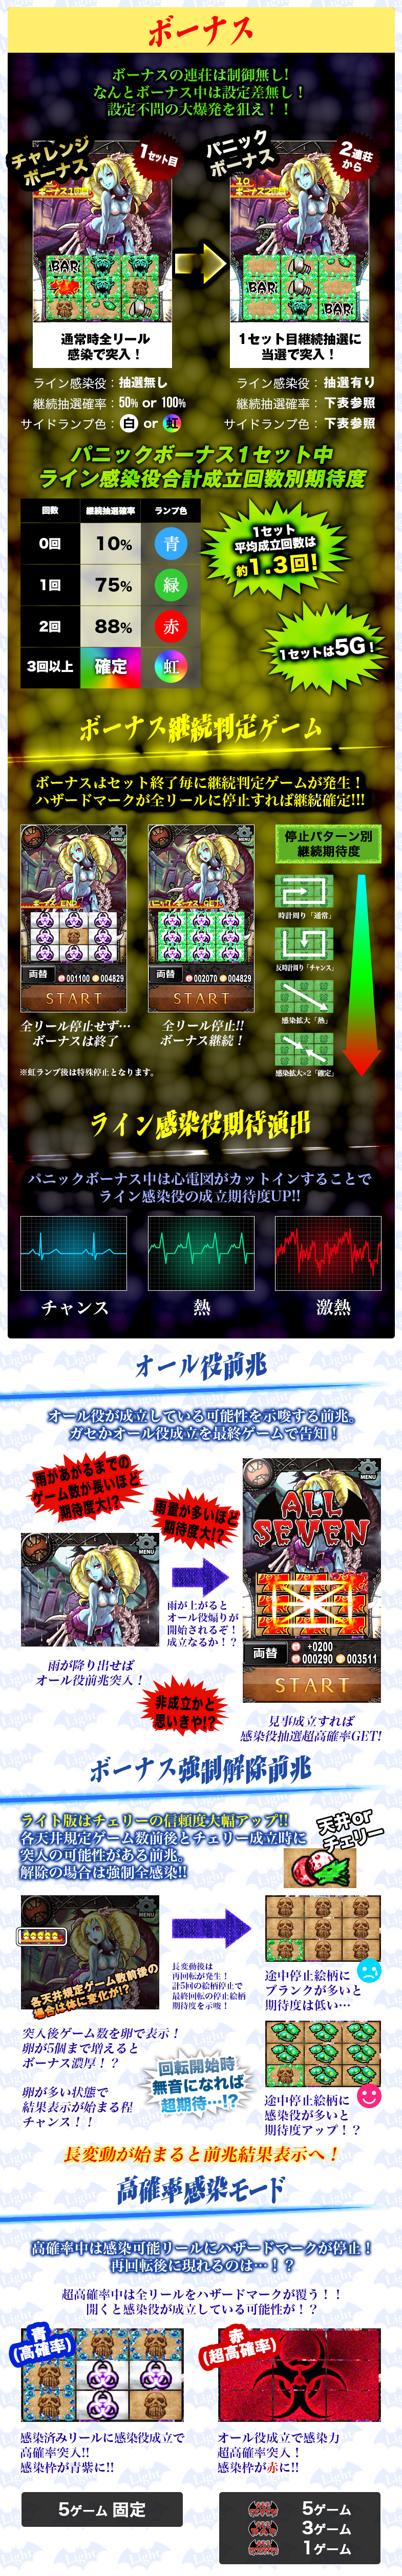 MONSTERS-ゾンビ-Light ボーナス・その他